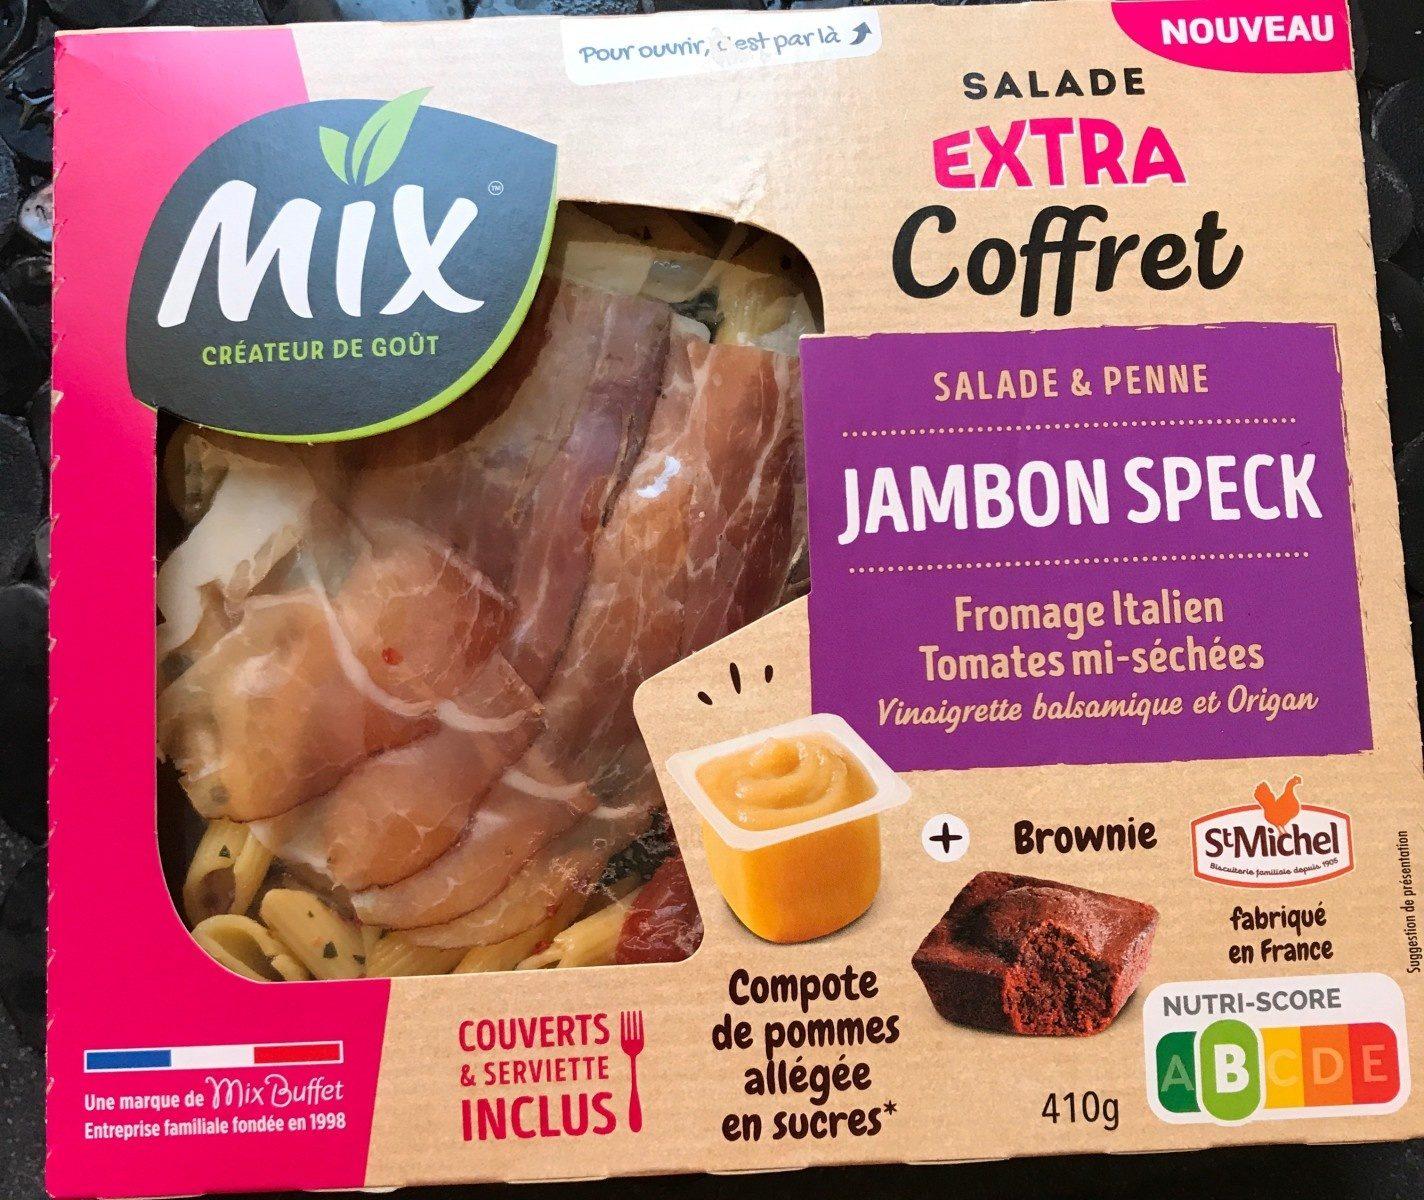 Salade extra coffret jambon speck - Produit - fr